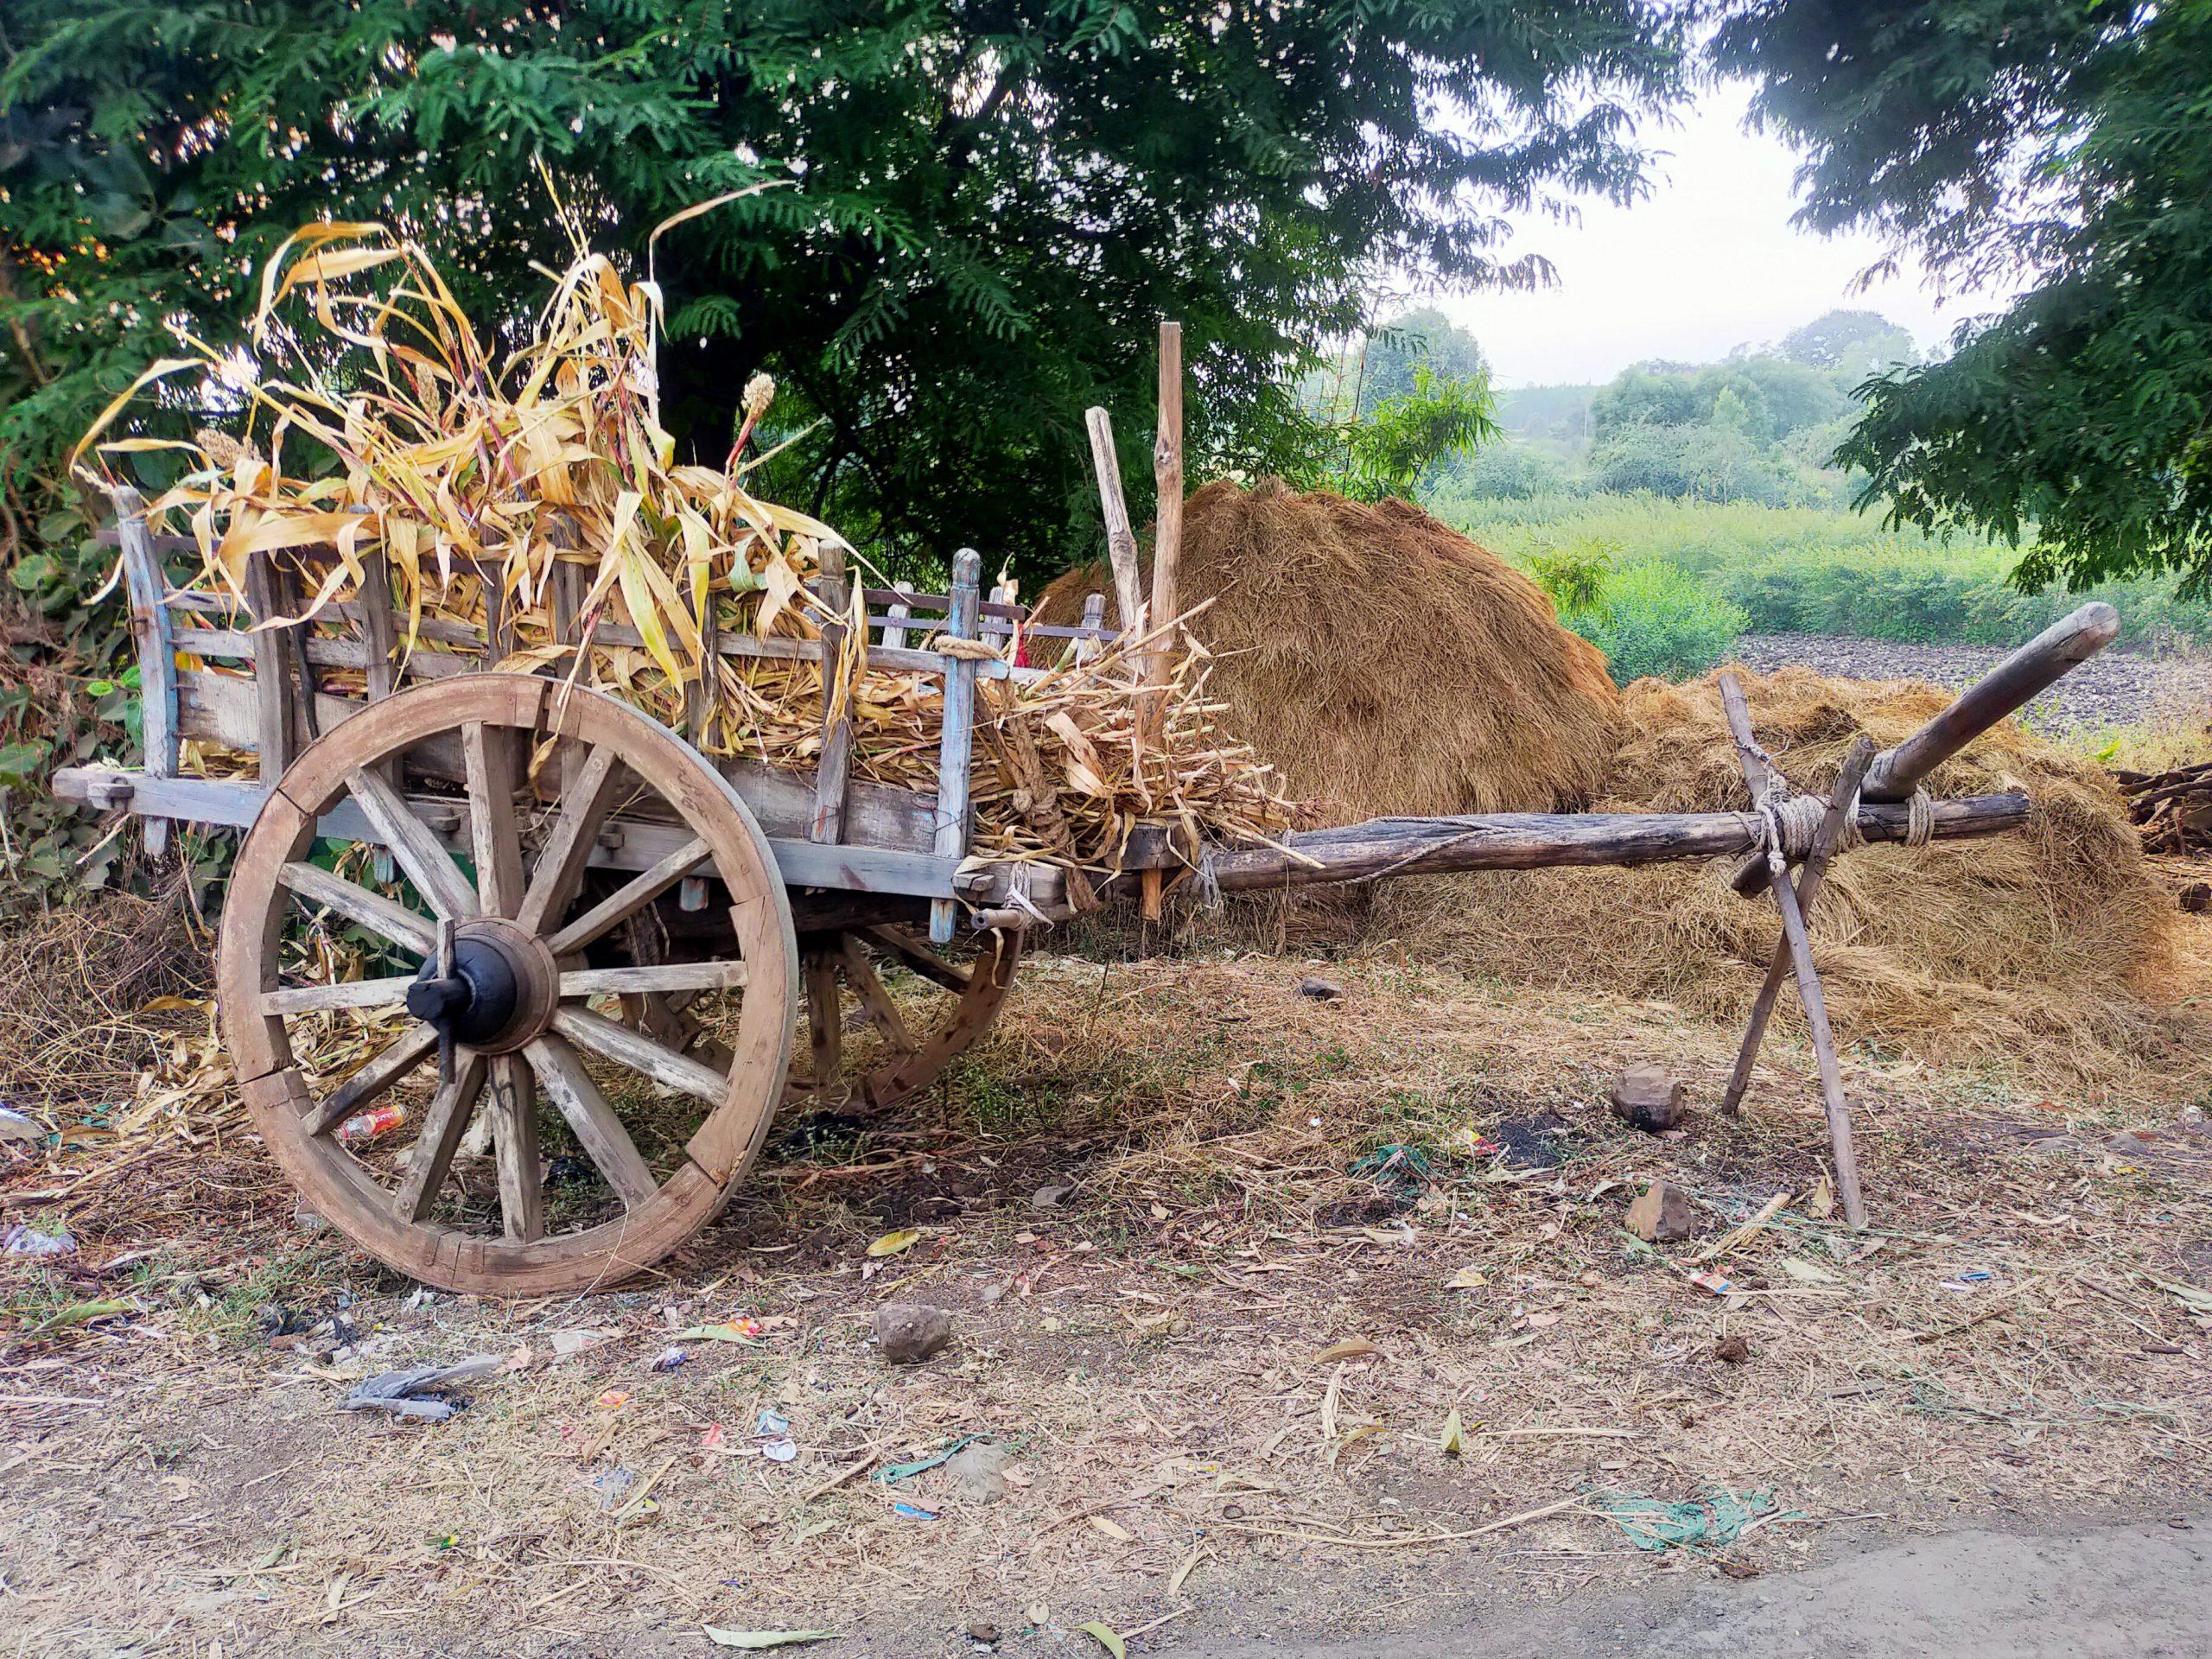 An oxcart